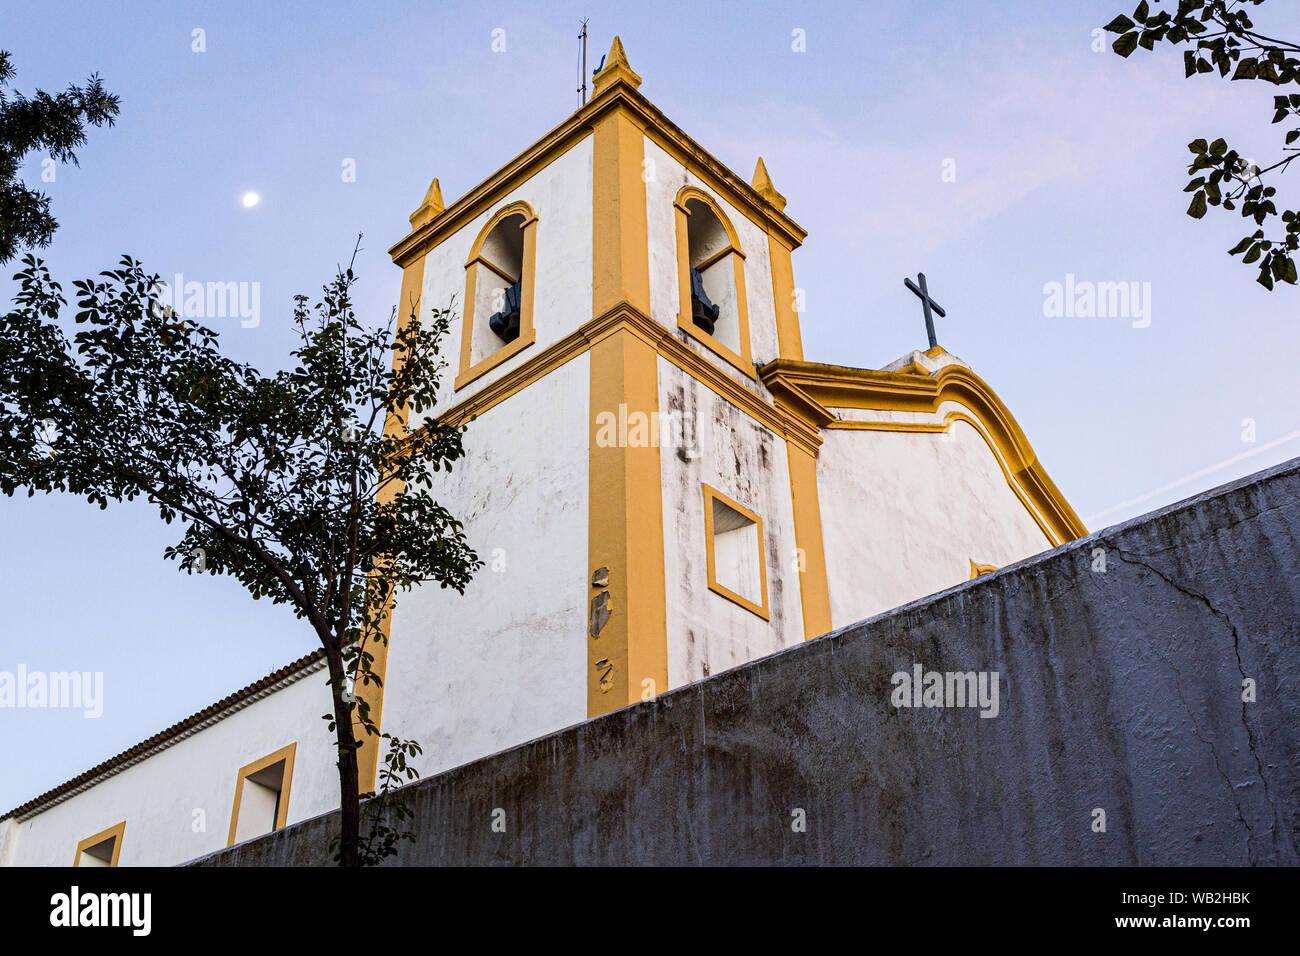 Bell tower of Nossa Senhora da Imaculada Conceicao Church, at Lagoa da Conceicao neighborhood, built in 1751. Florianopolis, Santa Catarina, Brazil. Stock Photo